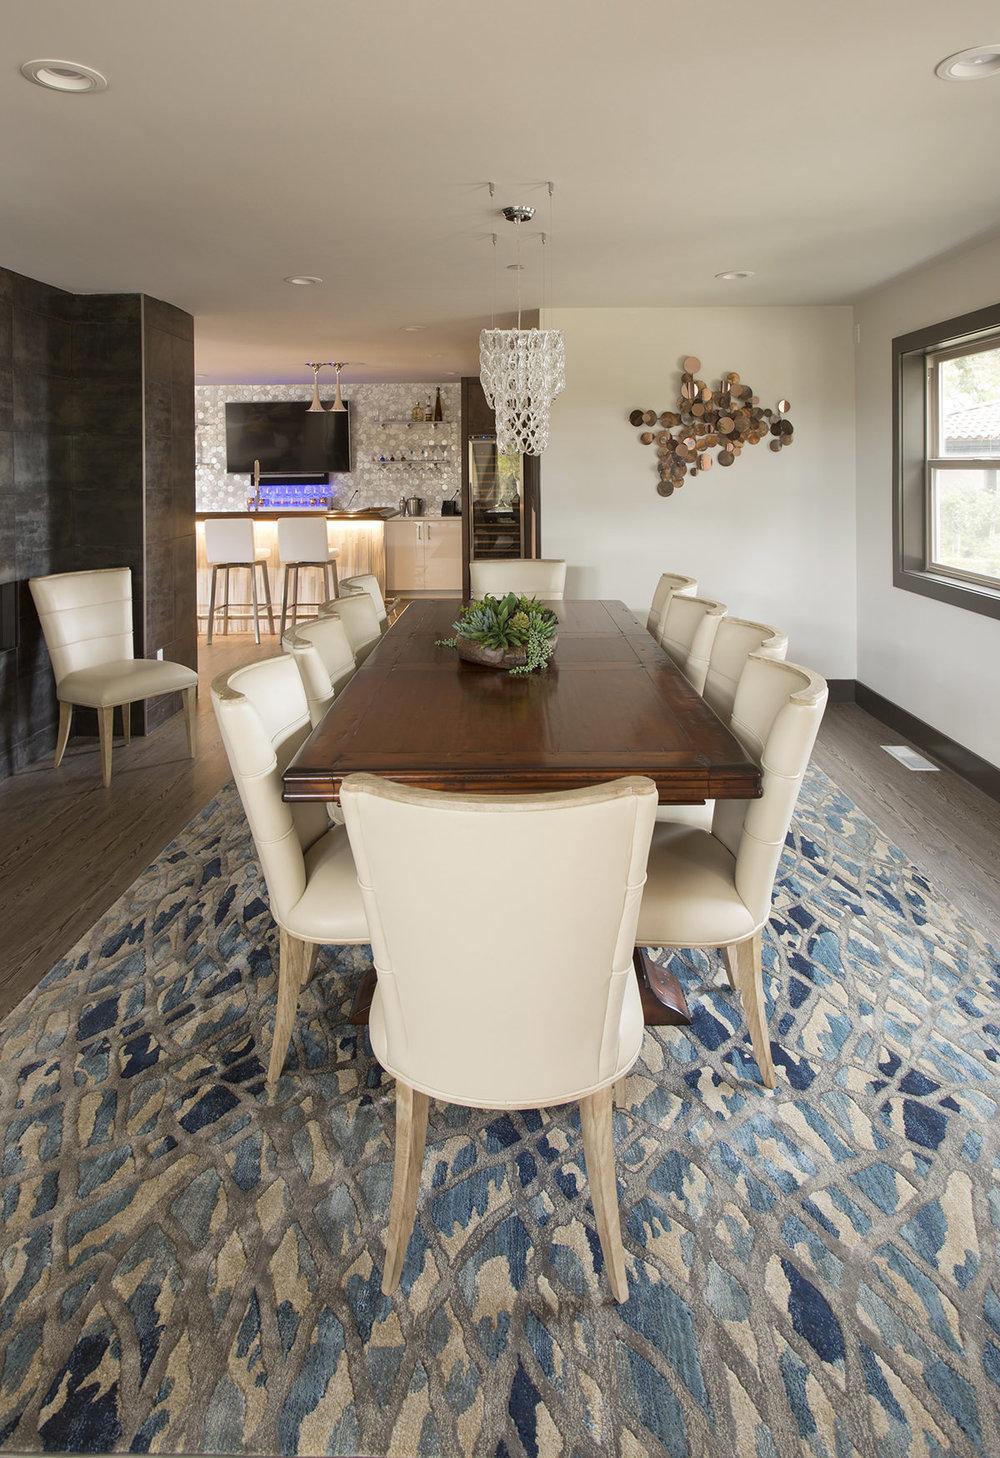 dining-room-decor-interior-design-los-altos-california-ktj-design-co-1.jpg